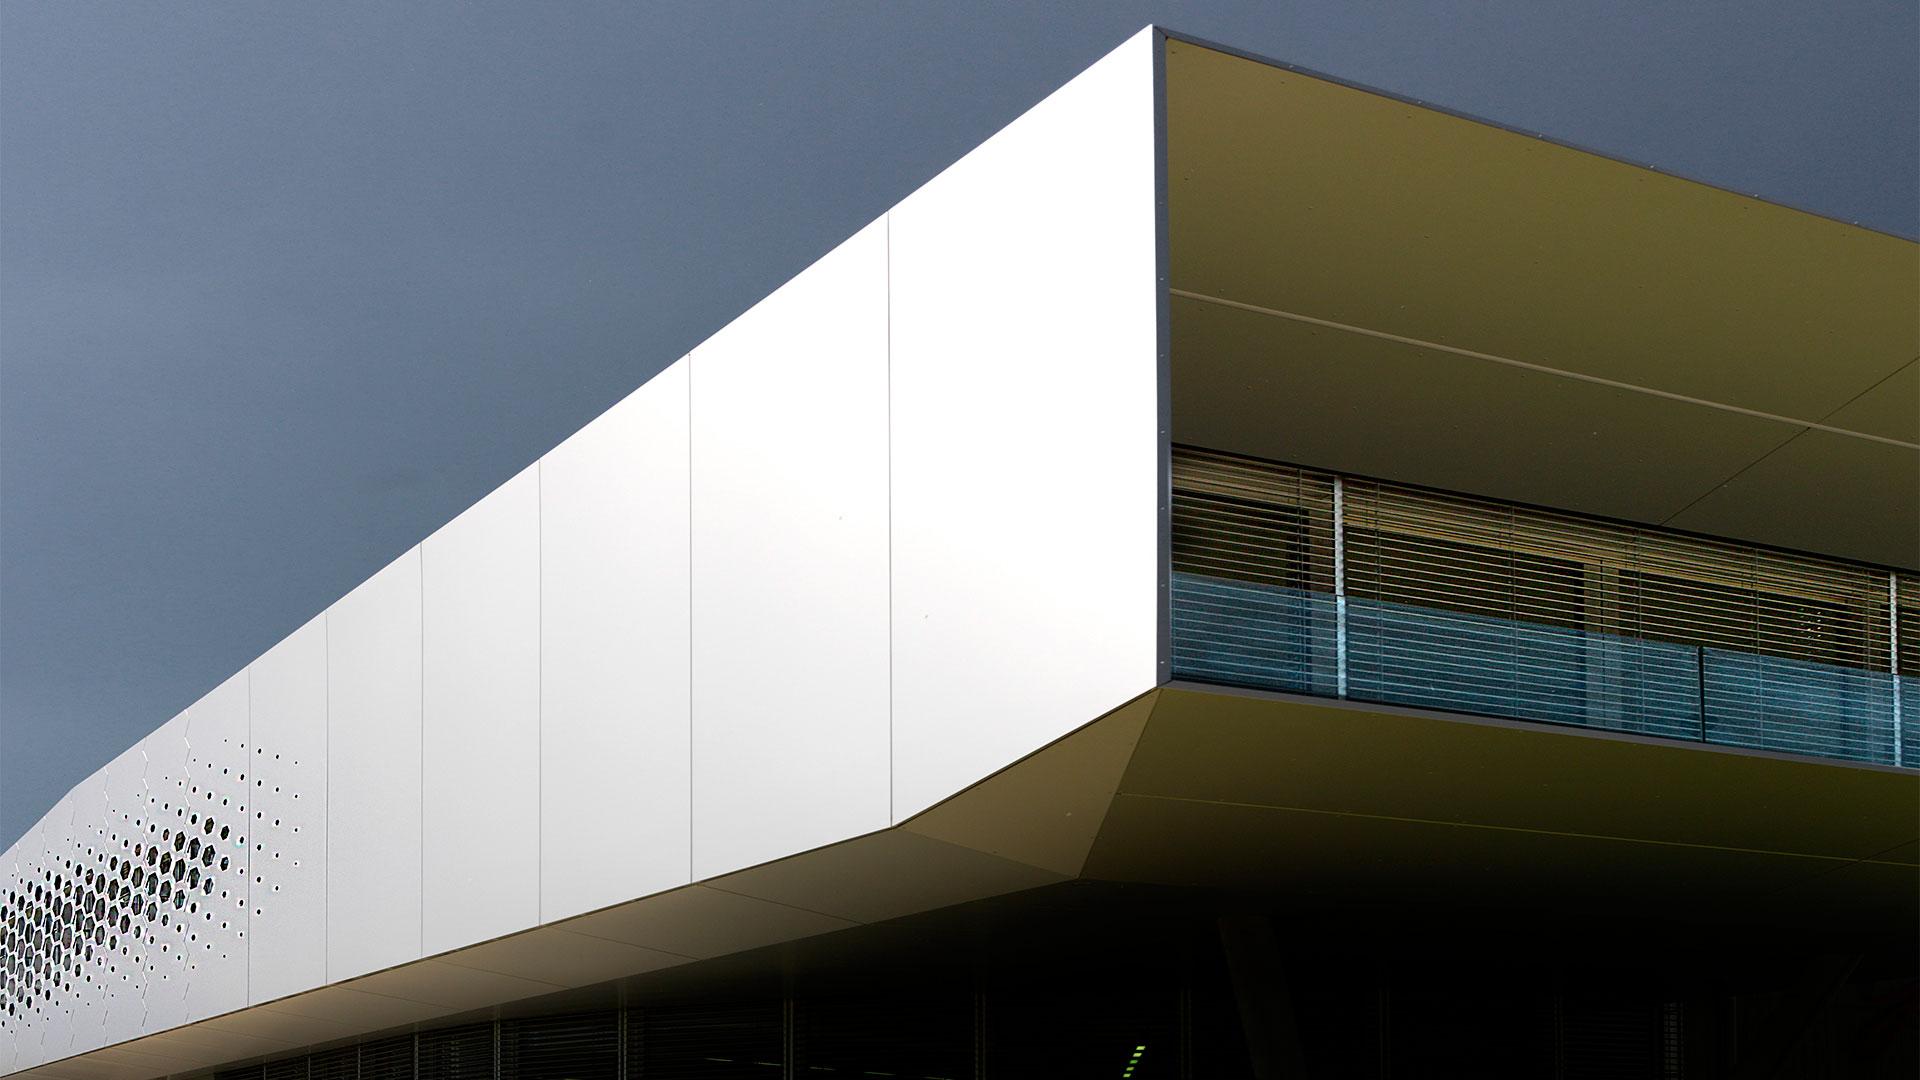 Goldhauben Webe, Architekturburo Klinglmuller ZT KG, Alucobond PLUS Silver Metallic, 2016